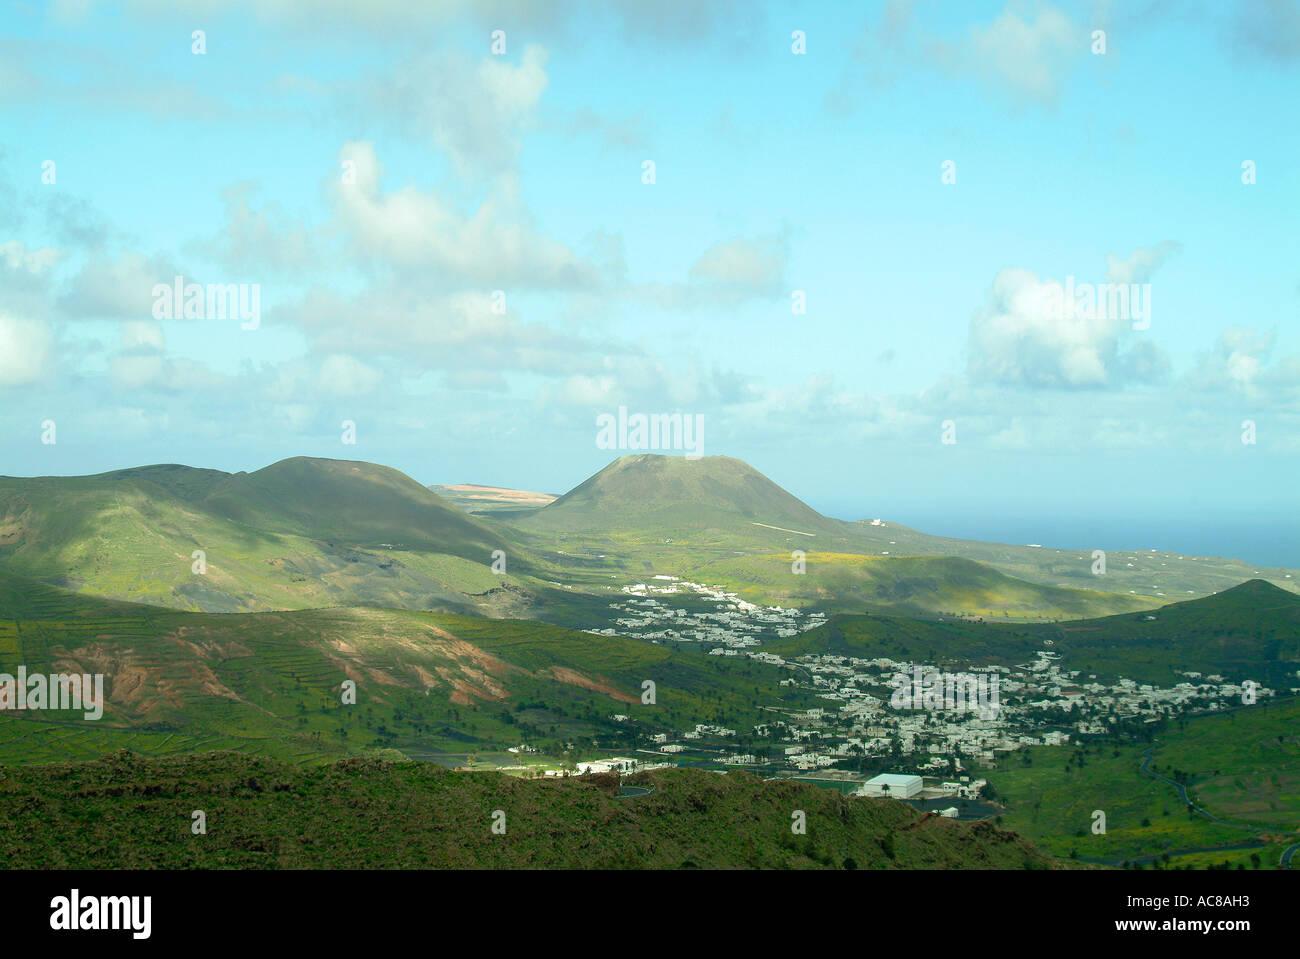 atlantic sea canary islands Atlantik Meer Kanarische Inseln Stock Photo